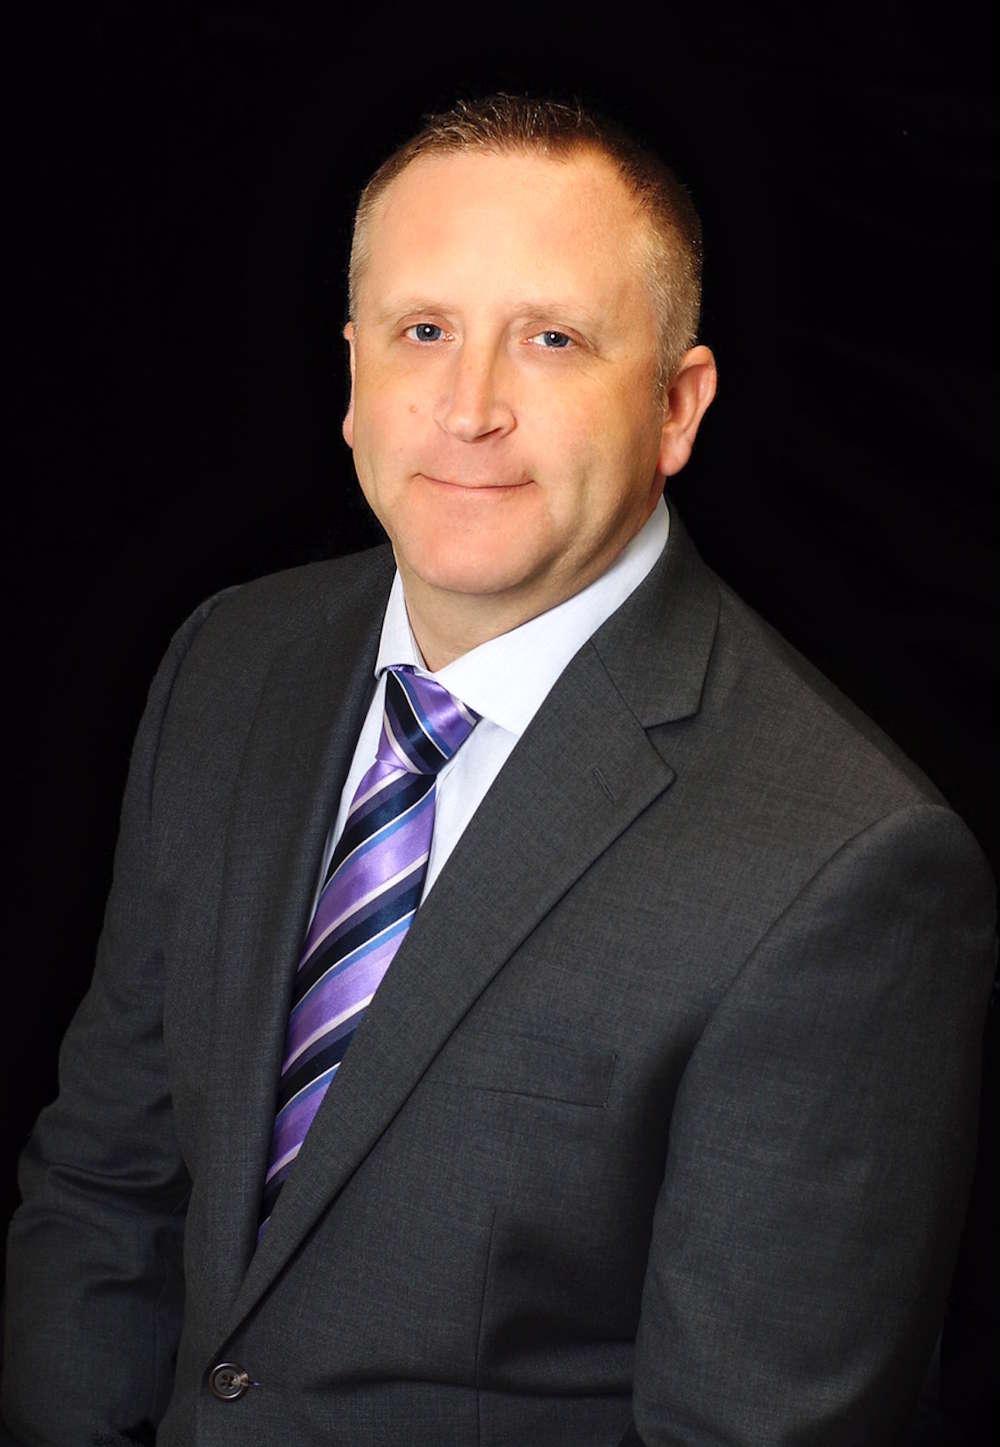 cott Raffaelli, vice president and general manager of Pettibone/Traverse Lift, LLC.